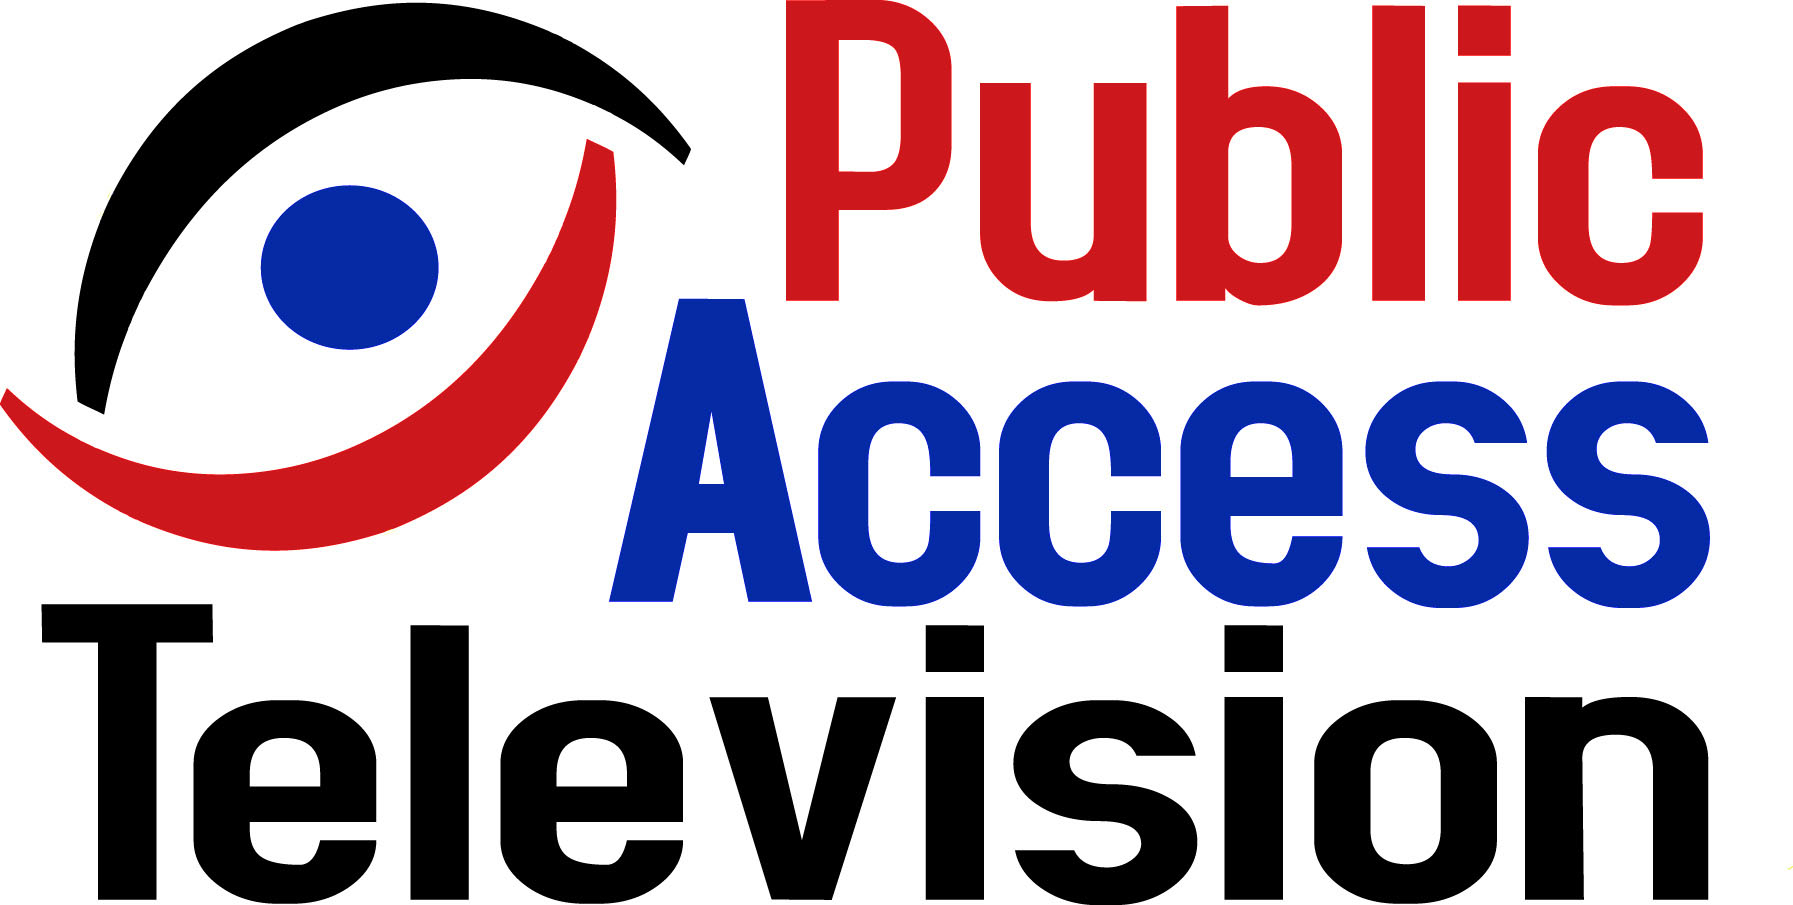 Public Access Television